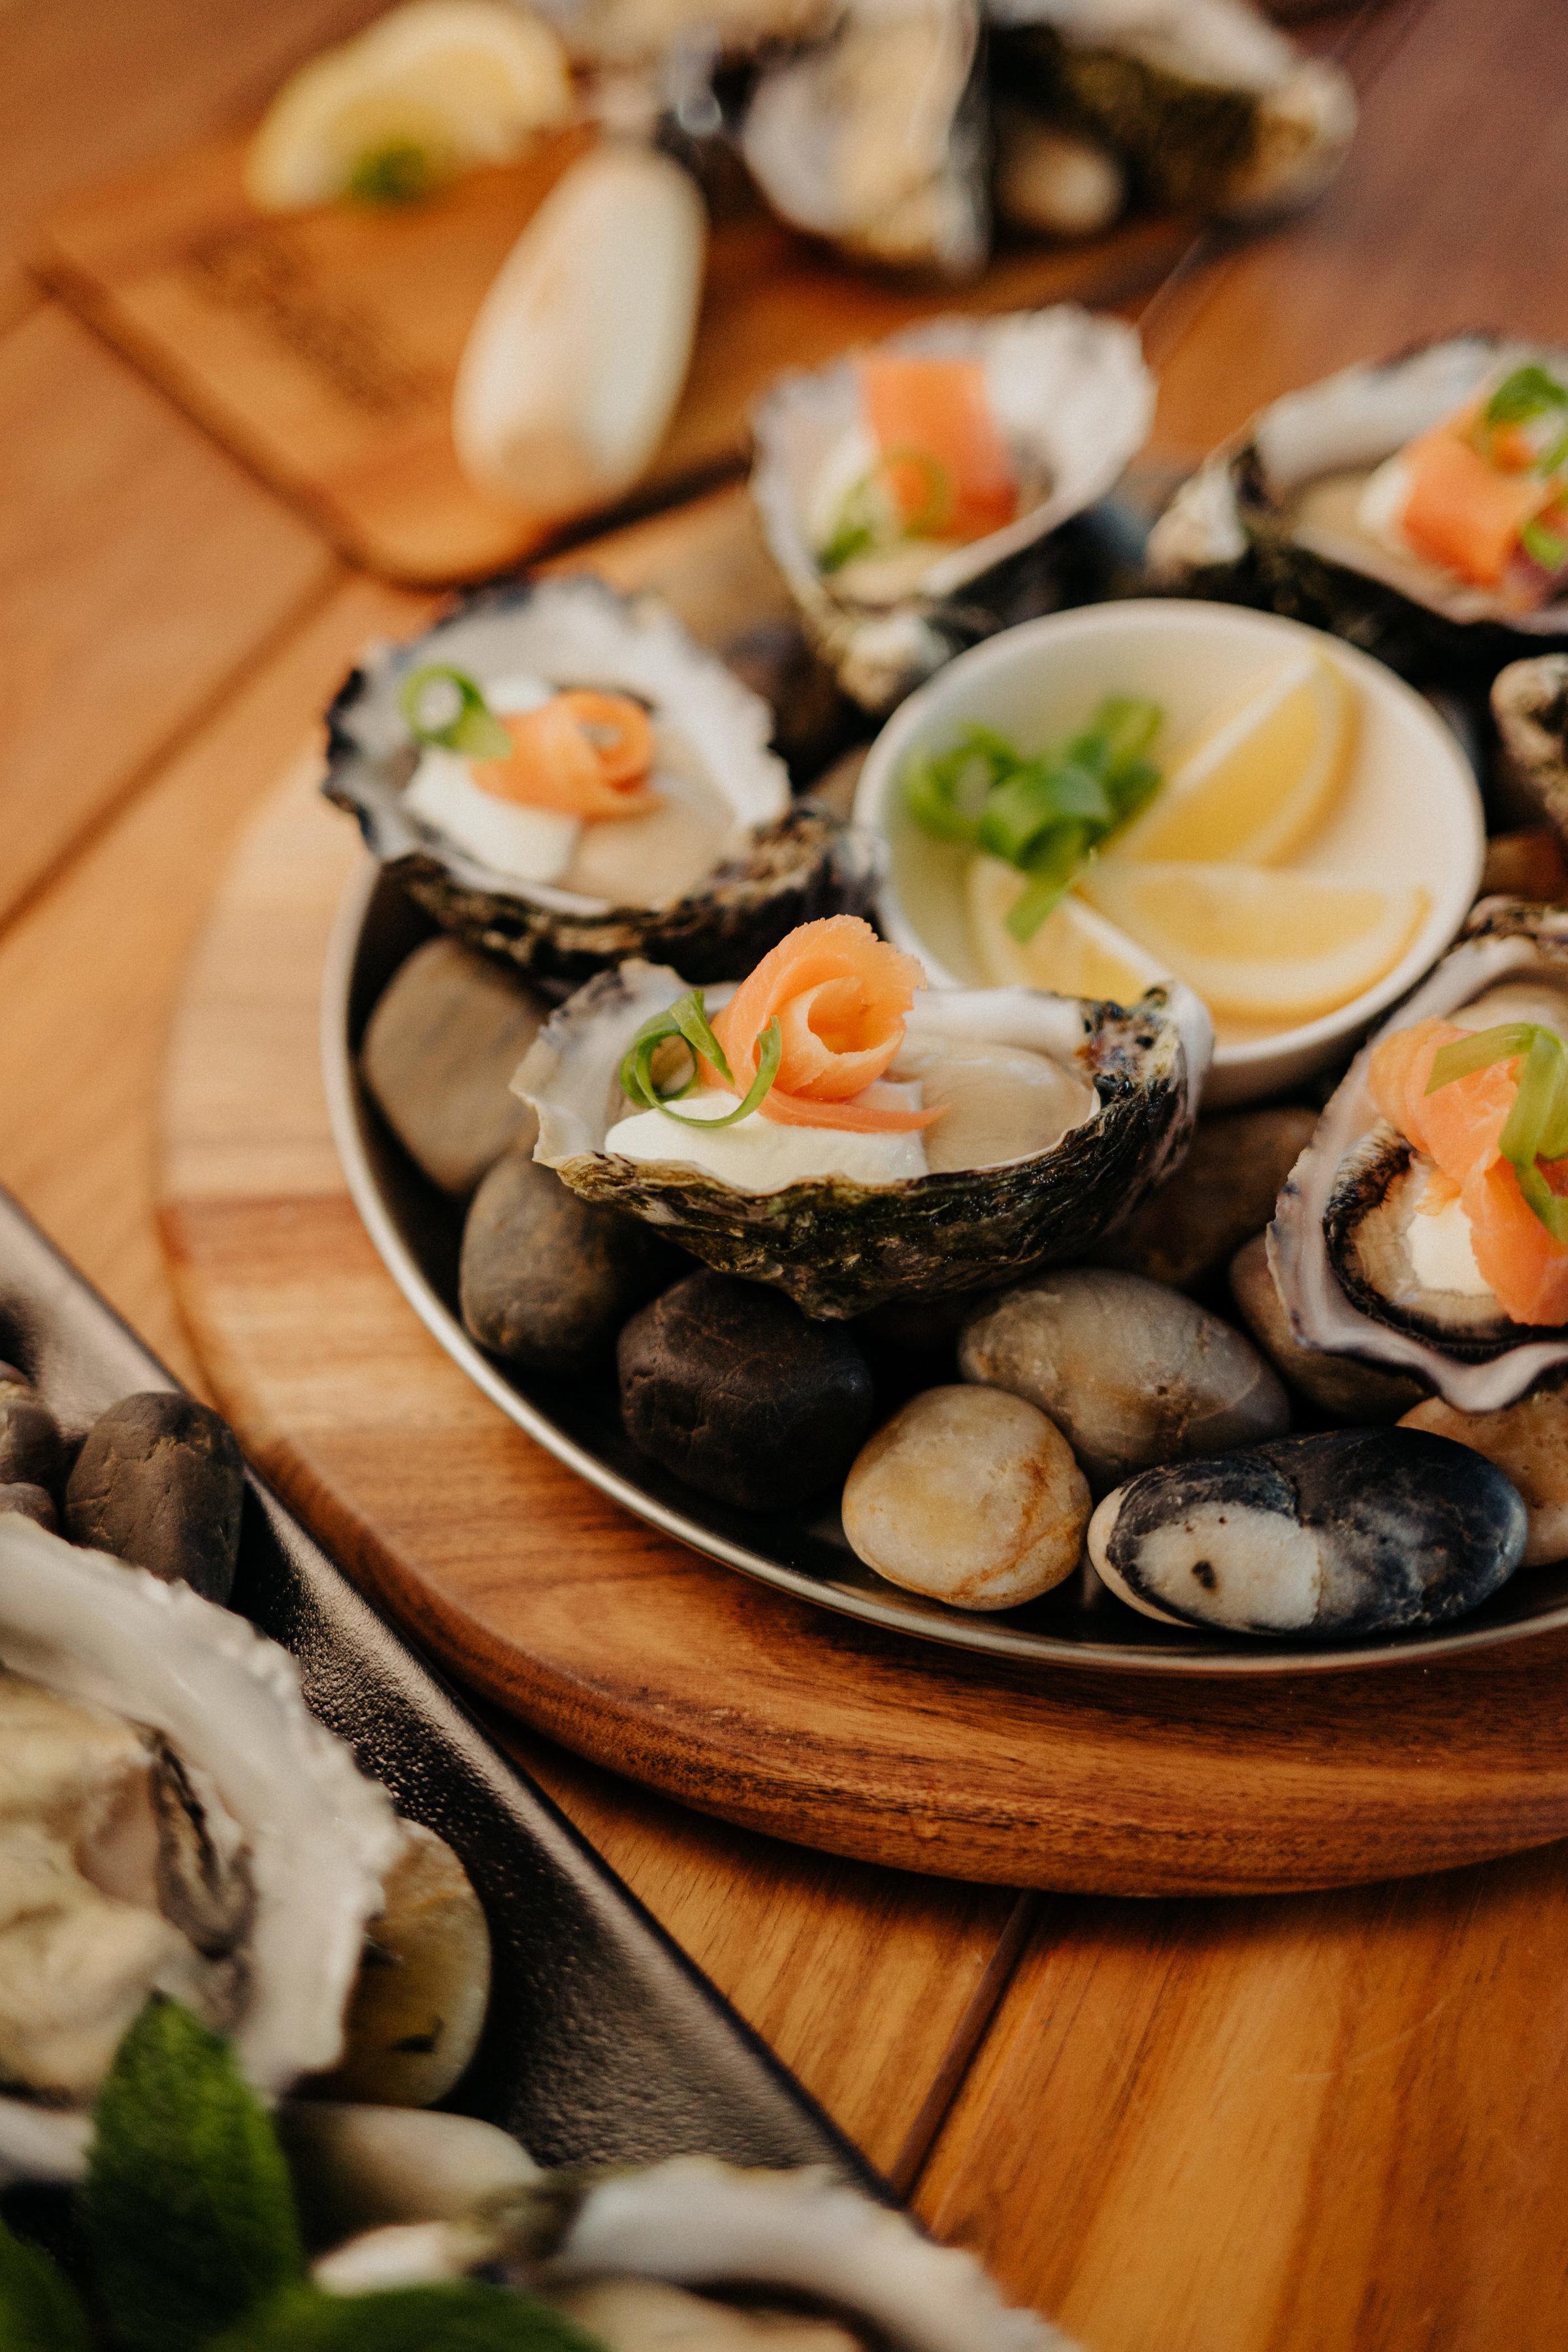 Tarkine-fresh-oyster-Andy-64